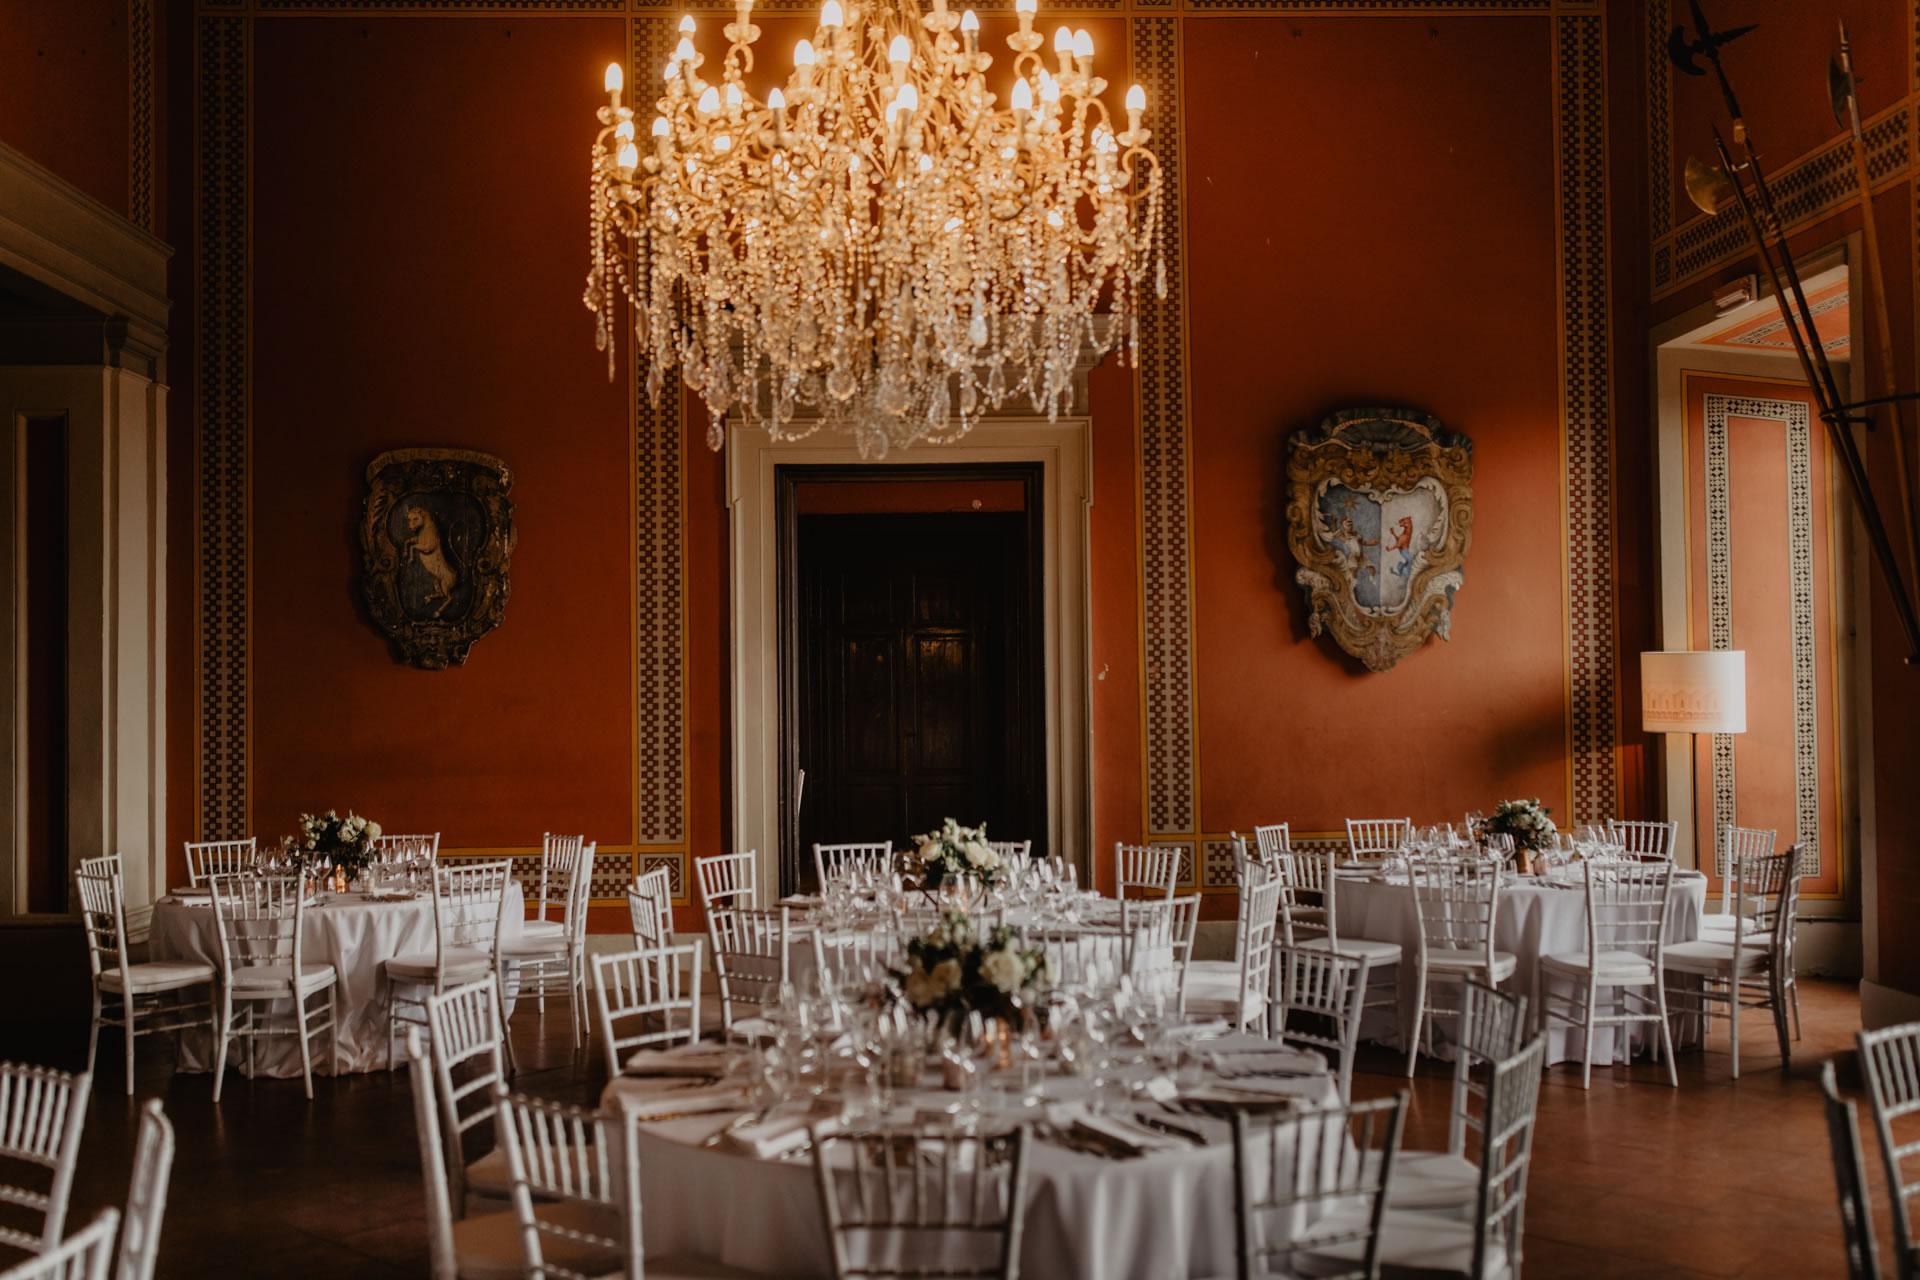 - 56 :: Indian wedding ceremony at Villa Pitiana :: Luxury wedding photography - 55 ::  - 56